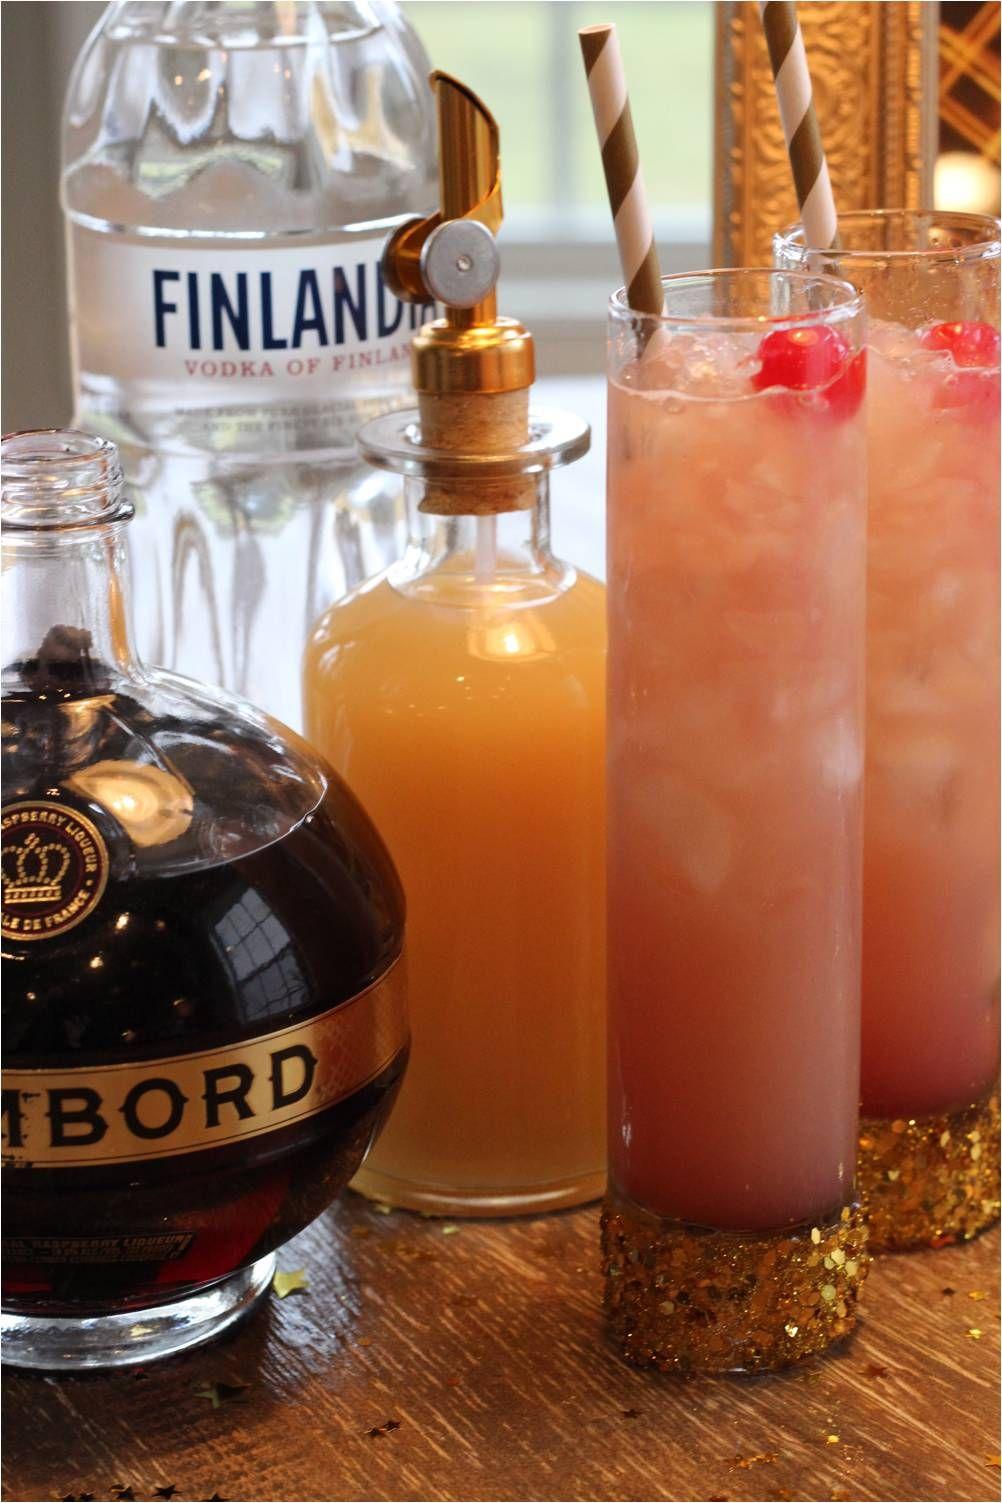 All That Glitters ~ 1oz Finlandia Vodka ~ .75oz #Chambord liqueur ~ 1oz White Grapefruit juice #Cocktail #NewYears @ChambordUS